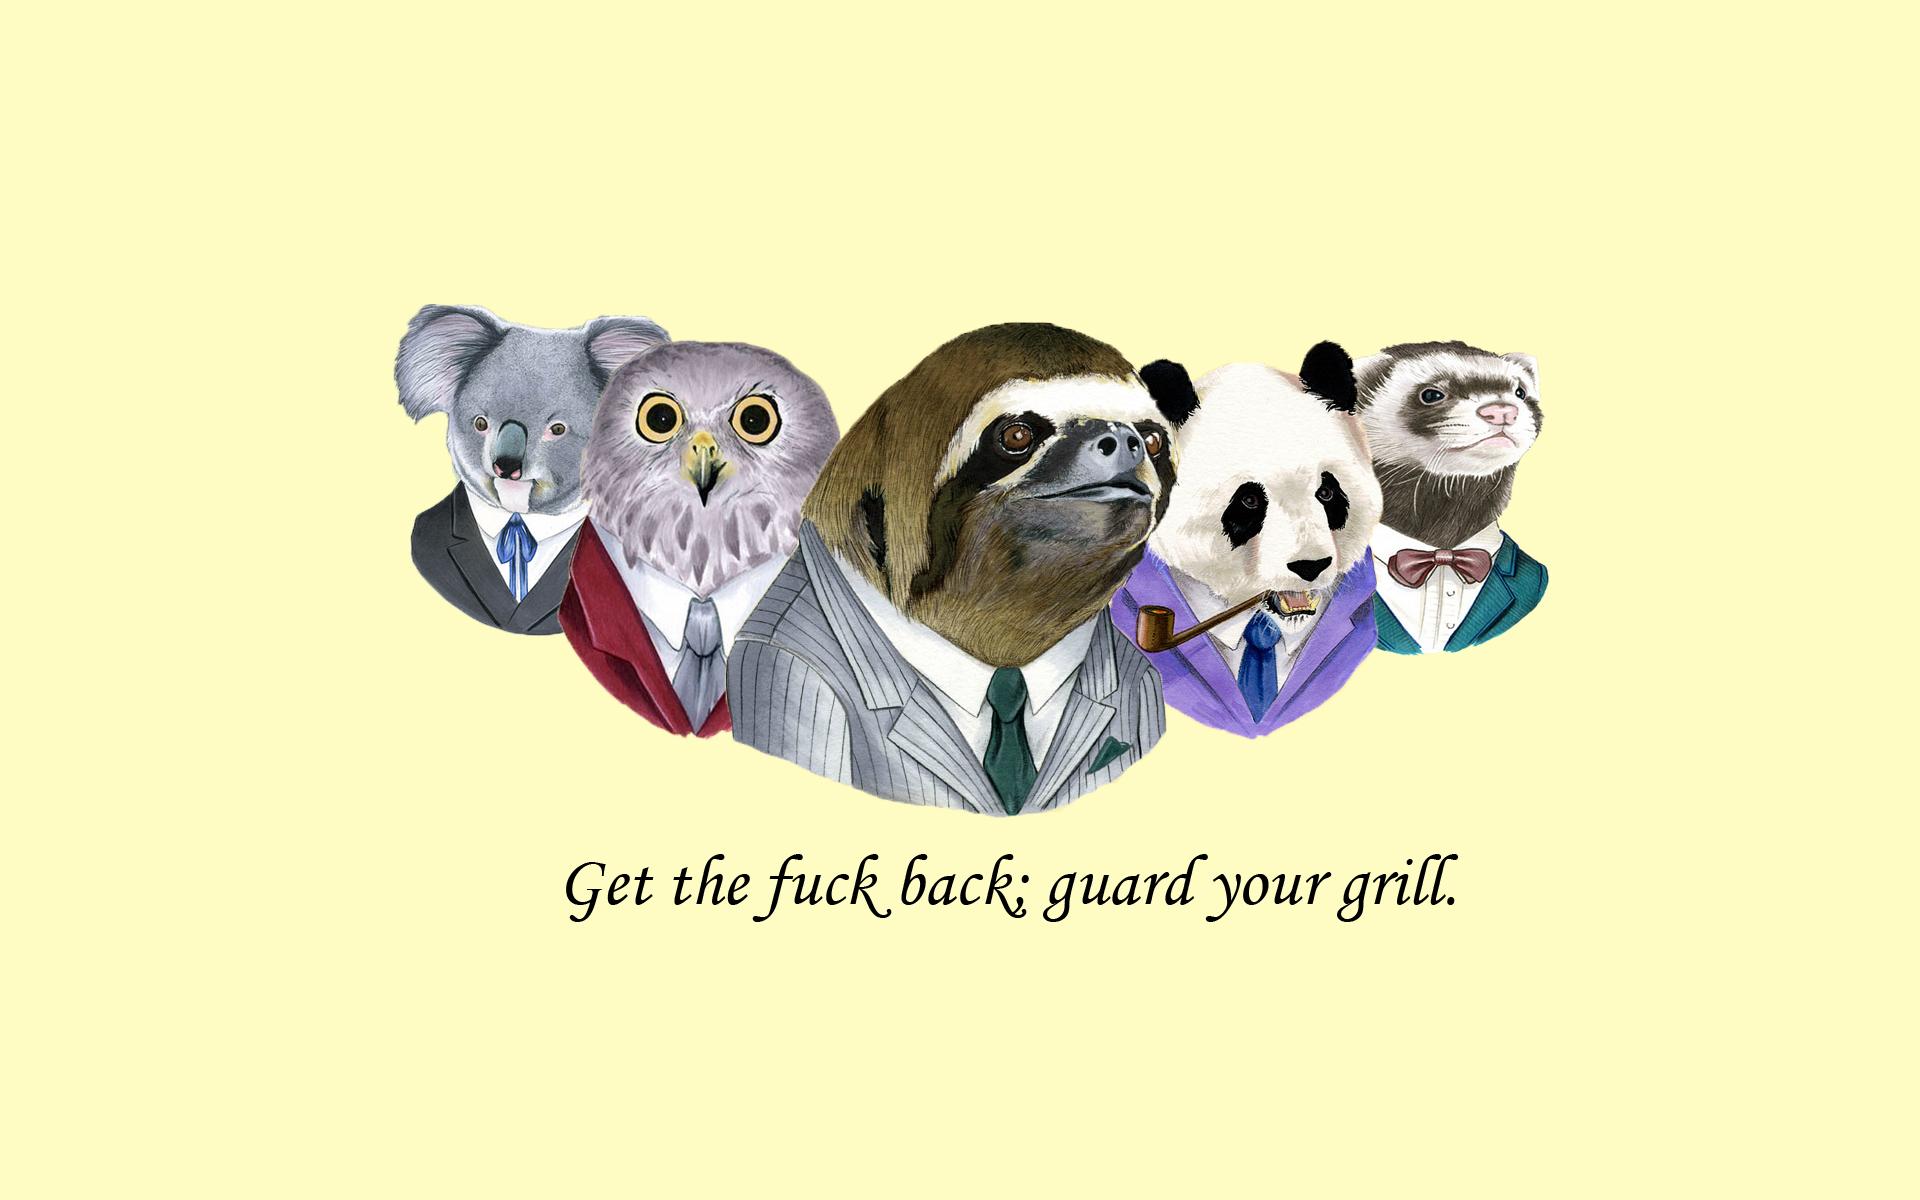 Good Wallpaper Koala Cartoon - 025b83fa0d3f795f5b96ec7ea2a536e5  Gallery_30516   .jpg